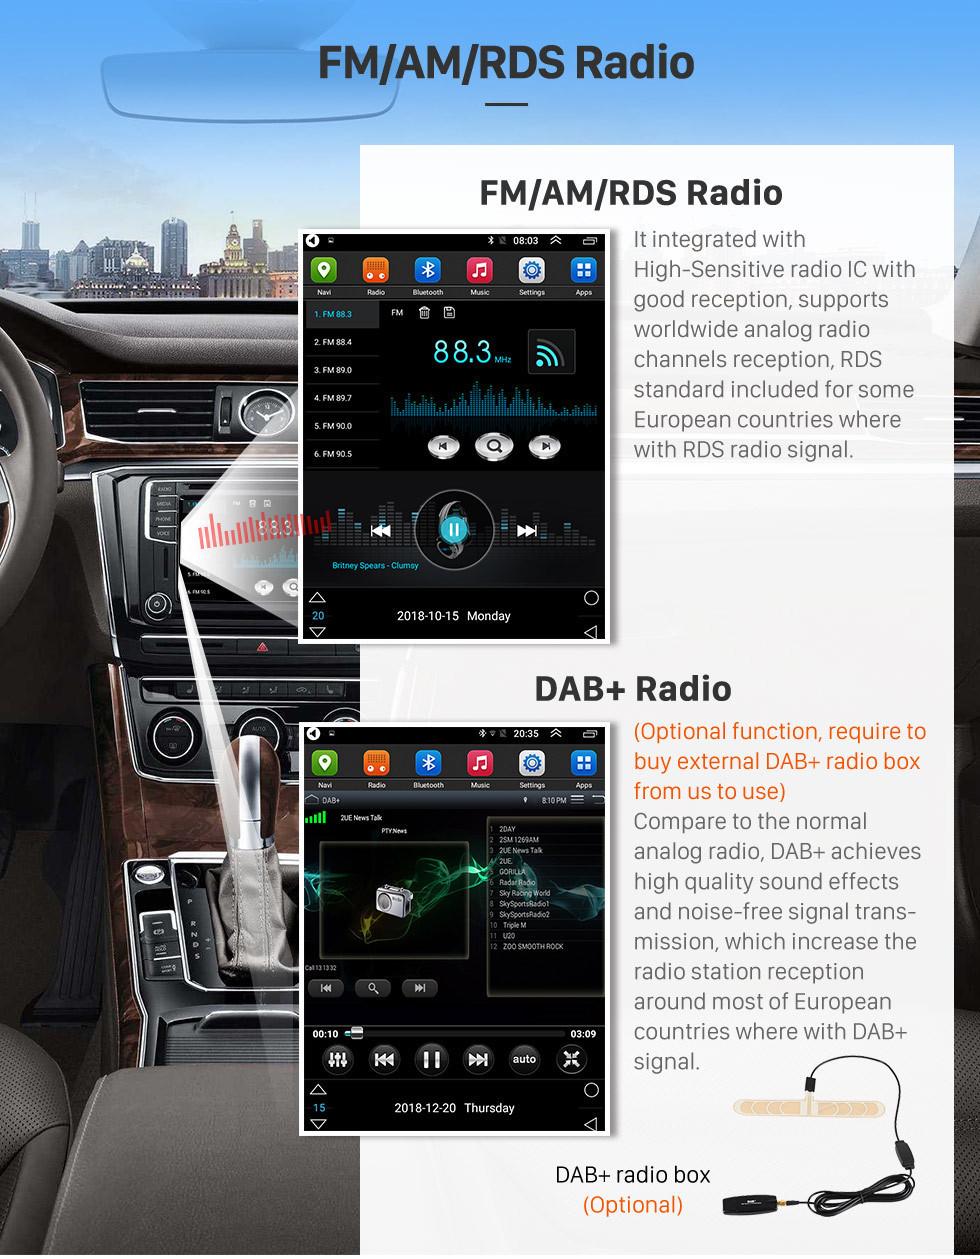 Seicane Pantalla táctil HD 2015 chevy Chevrolet Cruze Android 9.1 9.7 pulgadas Radio de navegación GPS Bluetooth WIFI soporte DAB + Control del volante Carplay